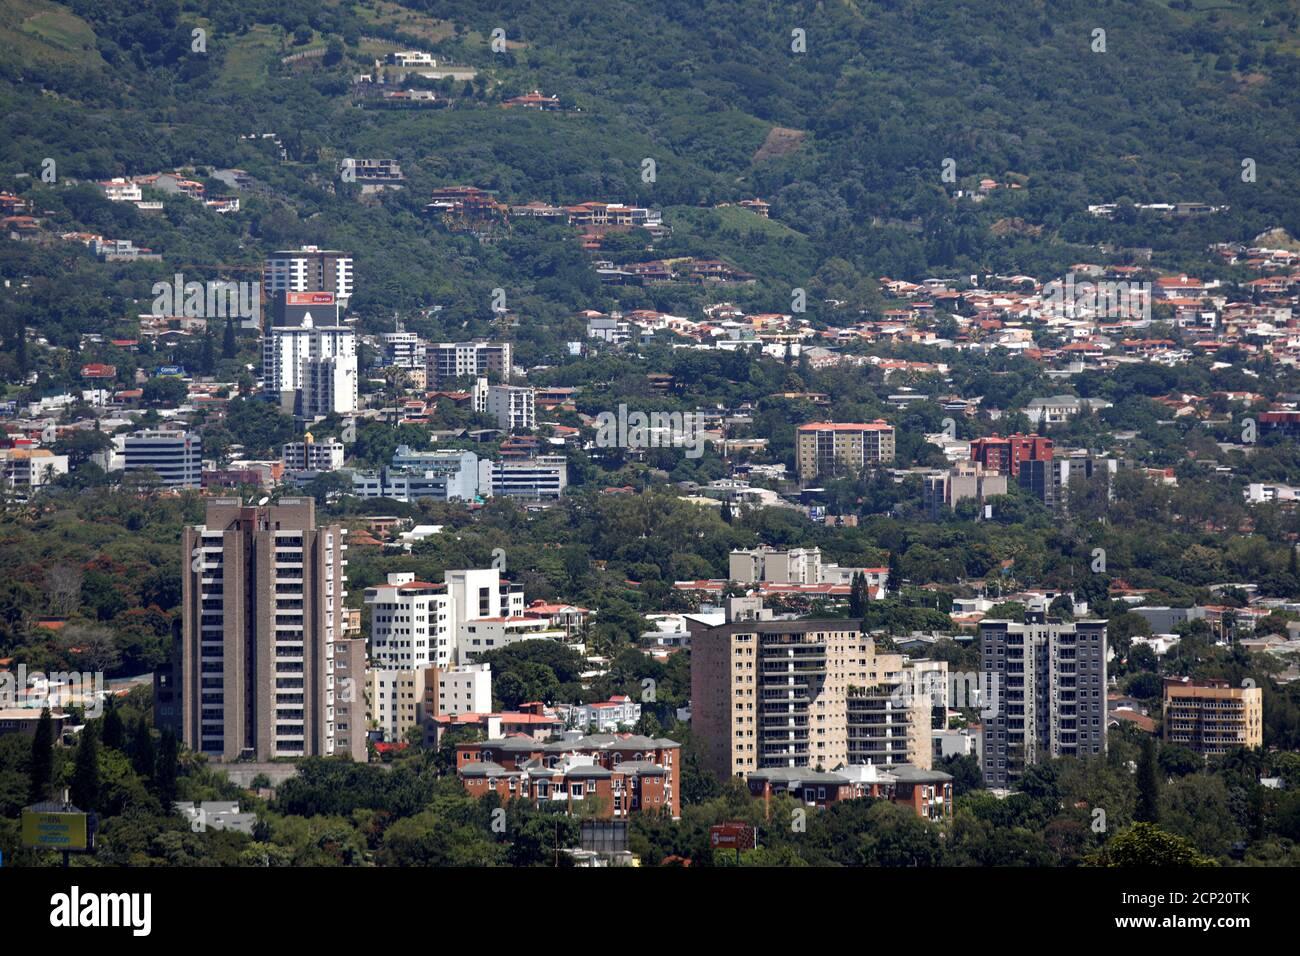 Residential buildings are seen in San Salvador, El Salvador September 24, 2018. REUTERS/Jose Cabezas Stock Photo